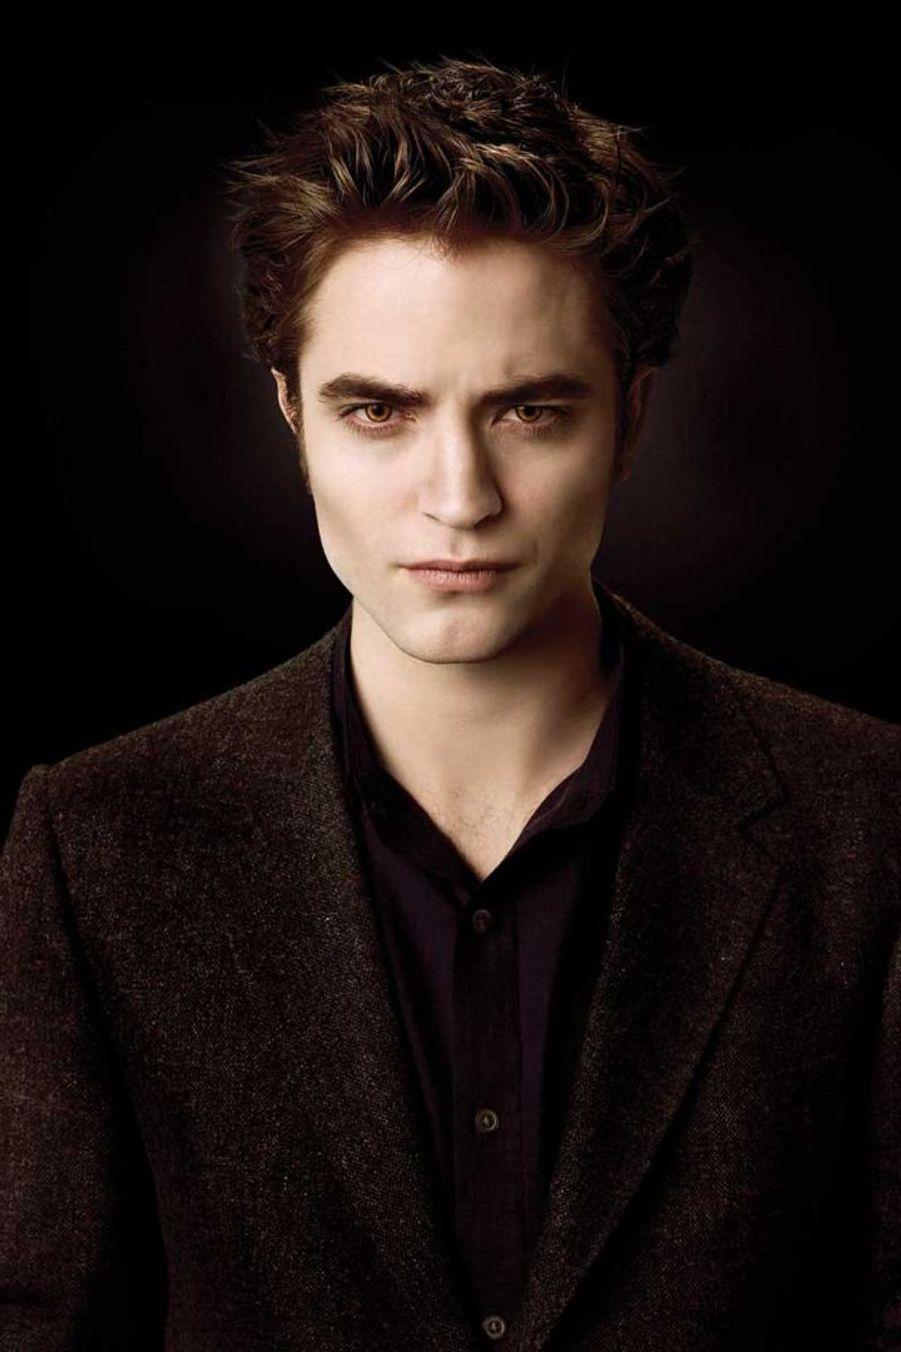 Robert Pattinson alias Edward Cullen